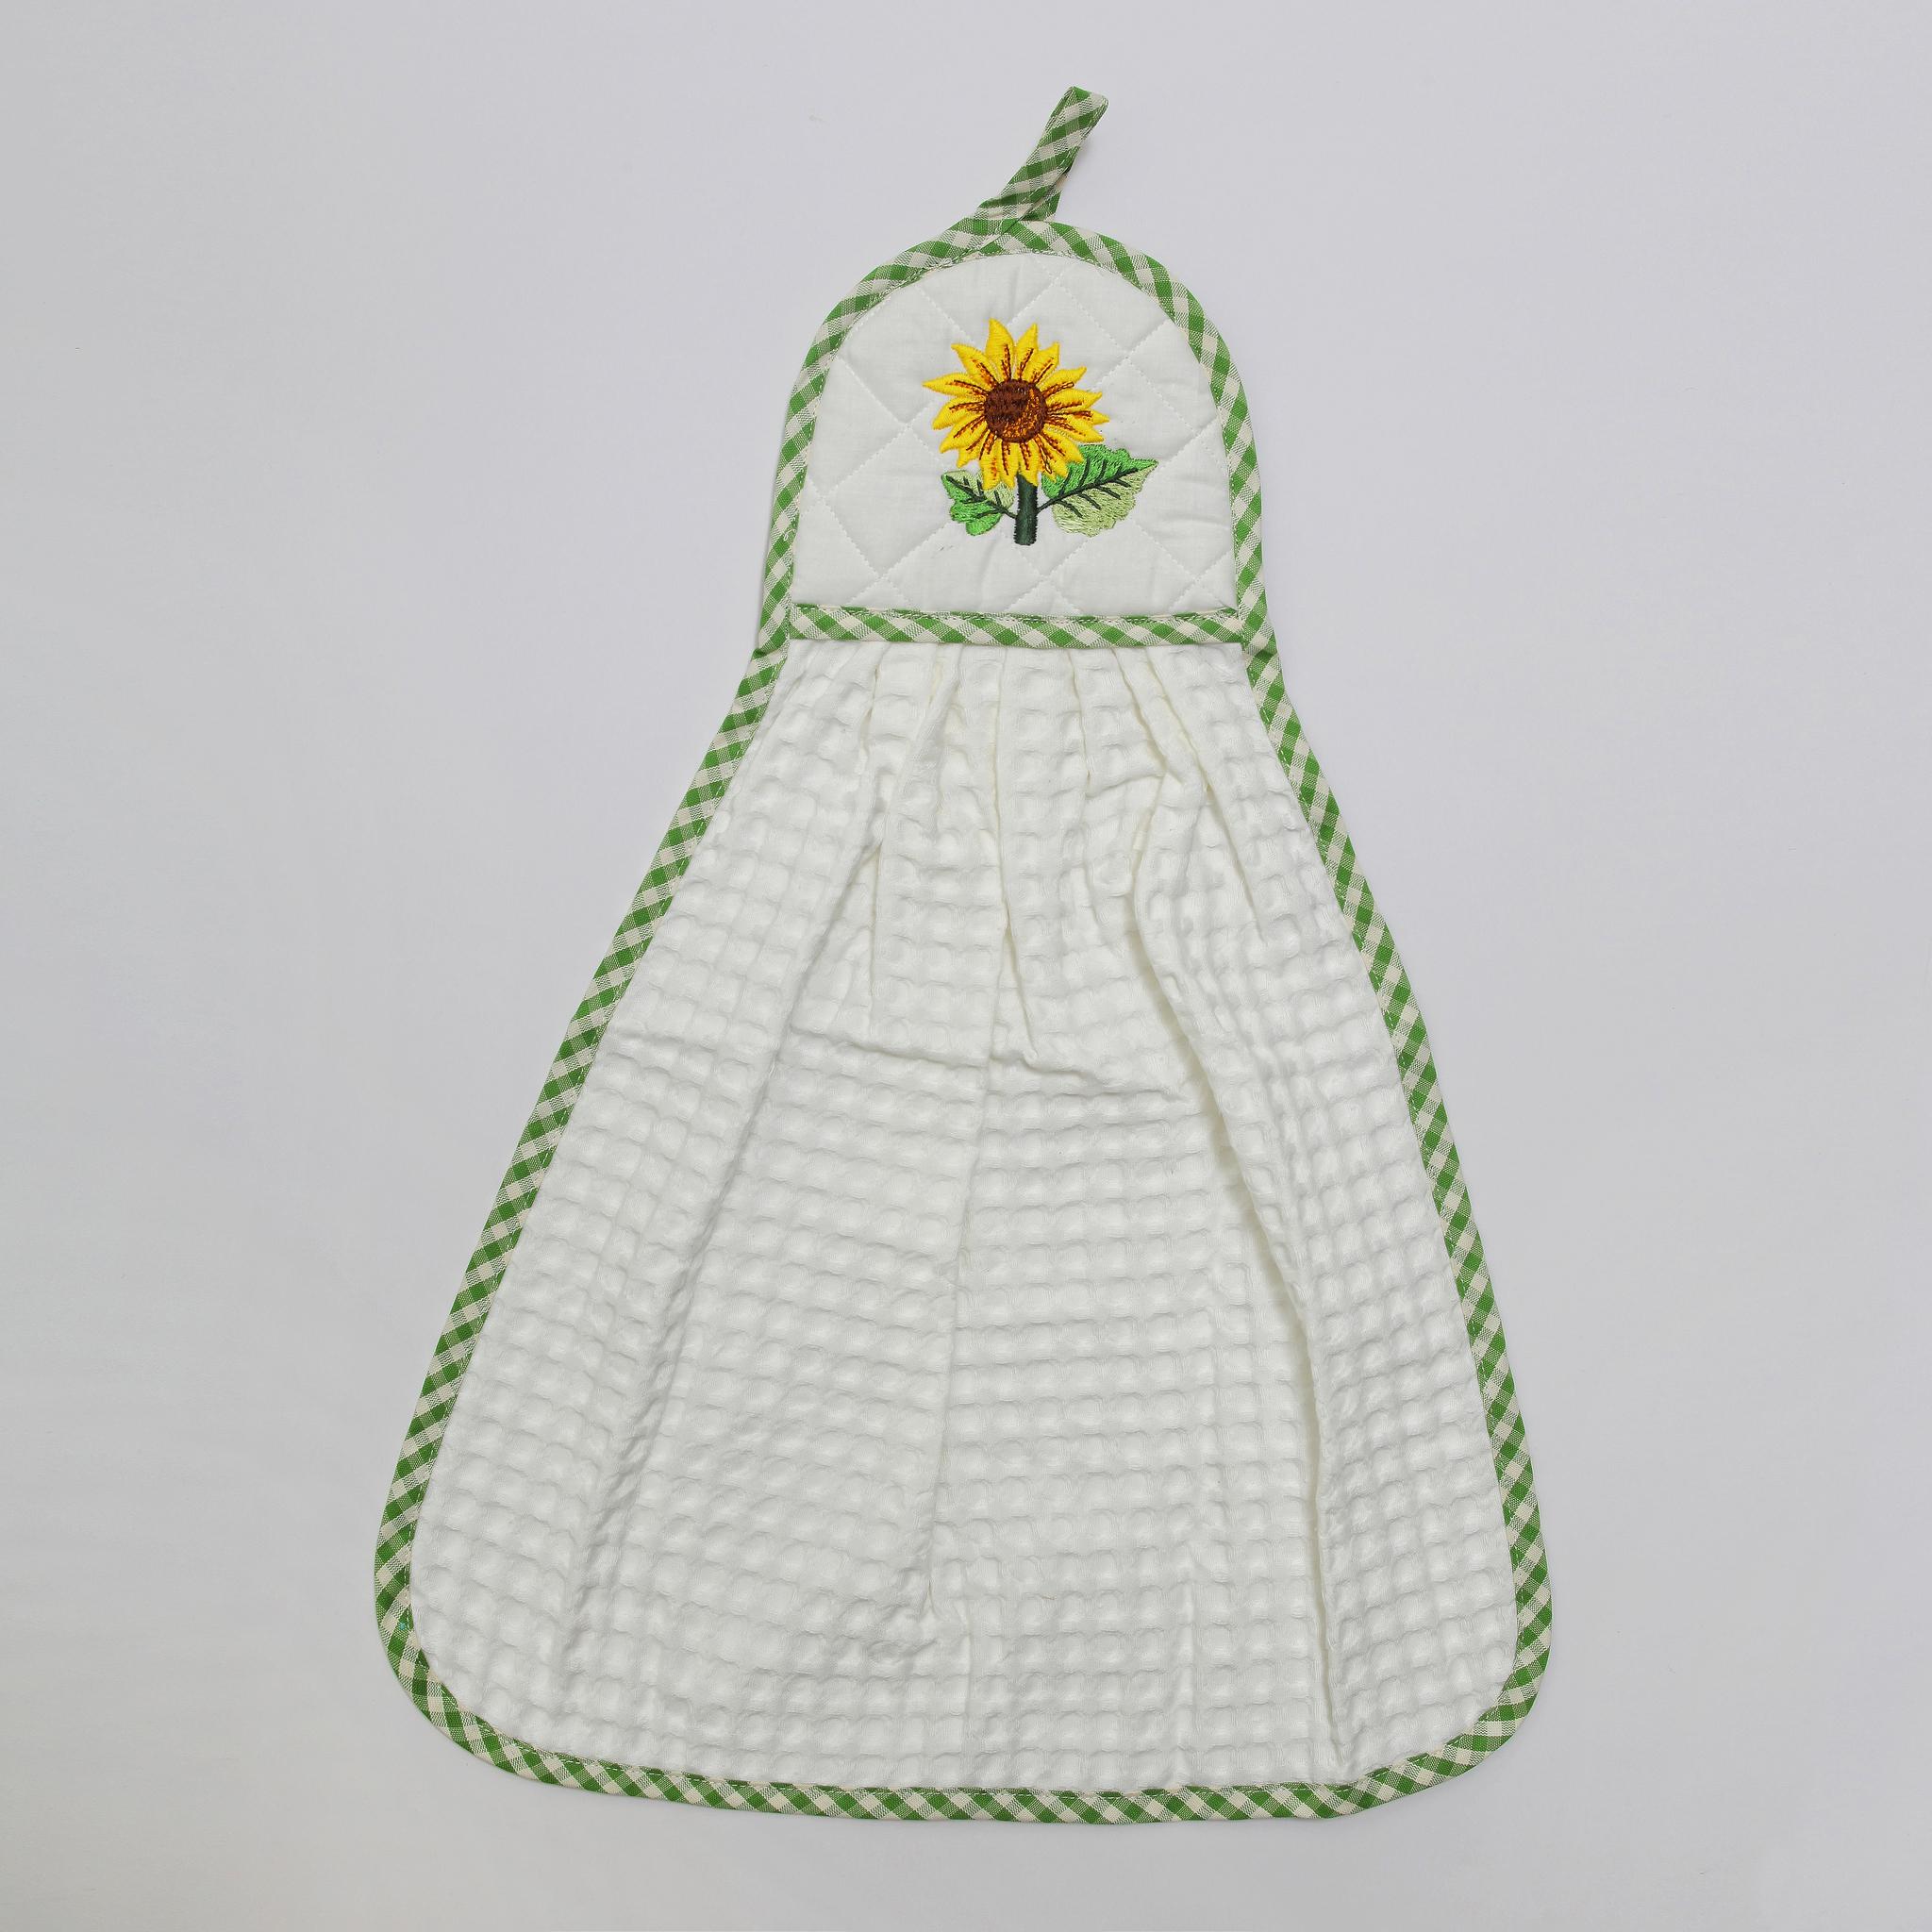 Кухонные полотенца Полотенце-галстук Old Florence Girasoli с зеленым кантом белое kuhonnoe-polotentse-galstuk-girasoli-s-zelyonym-kantom-ot-old-florence-italiya.JPG